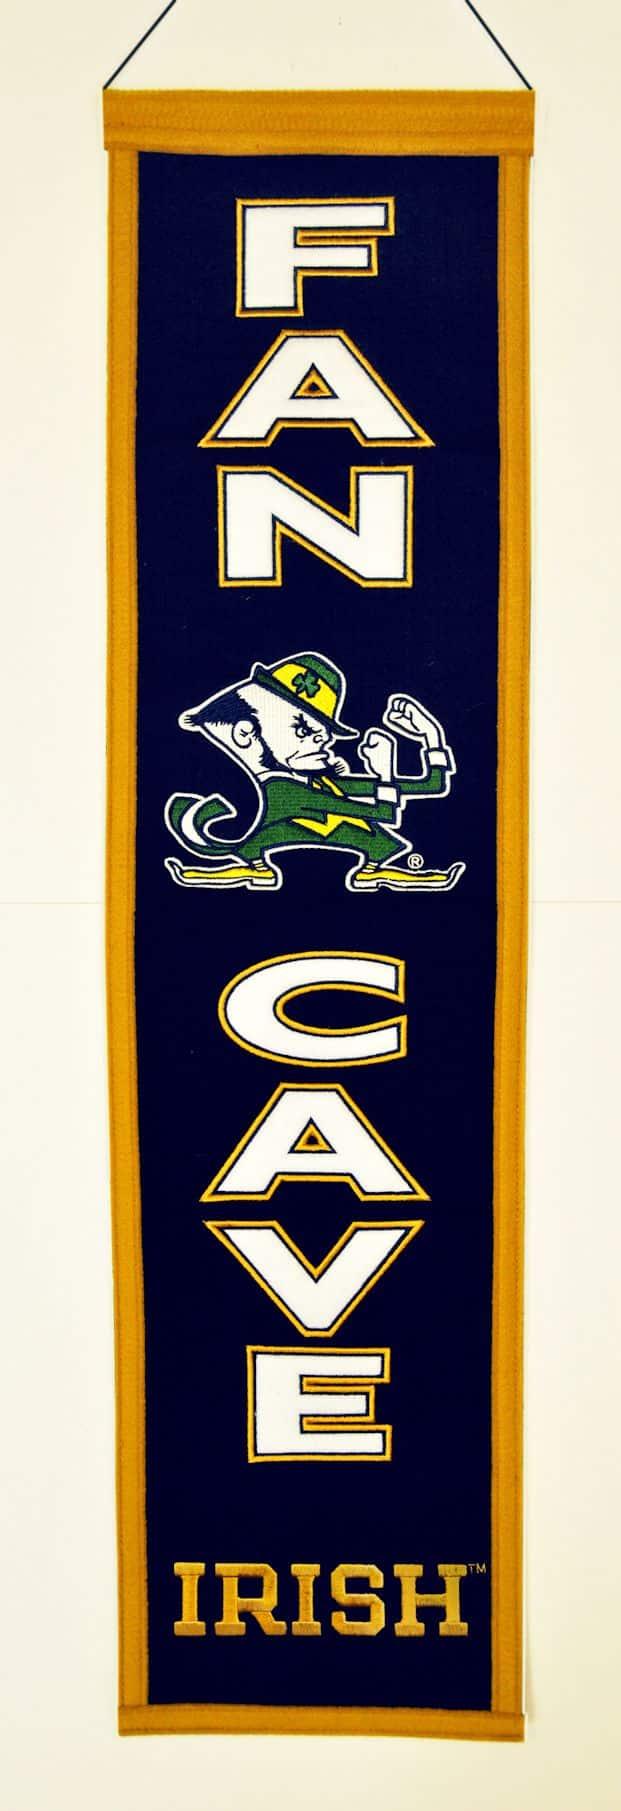 Notre Dame Man Cave Ideas : Notre dame fighting irish wool man cave banner detroit